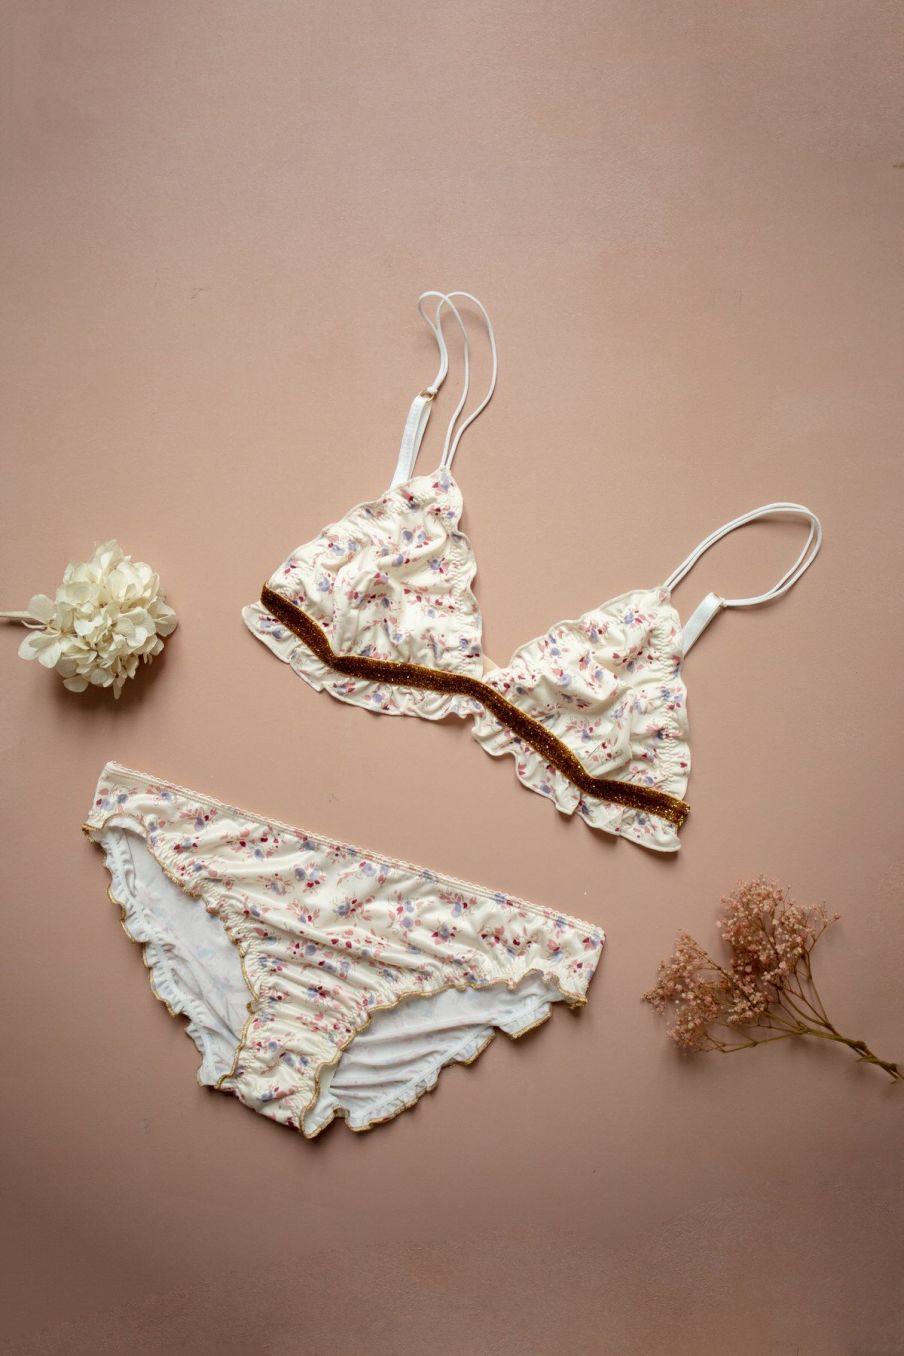 boheme chic vintage culotte femme mimina cream blossom